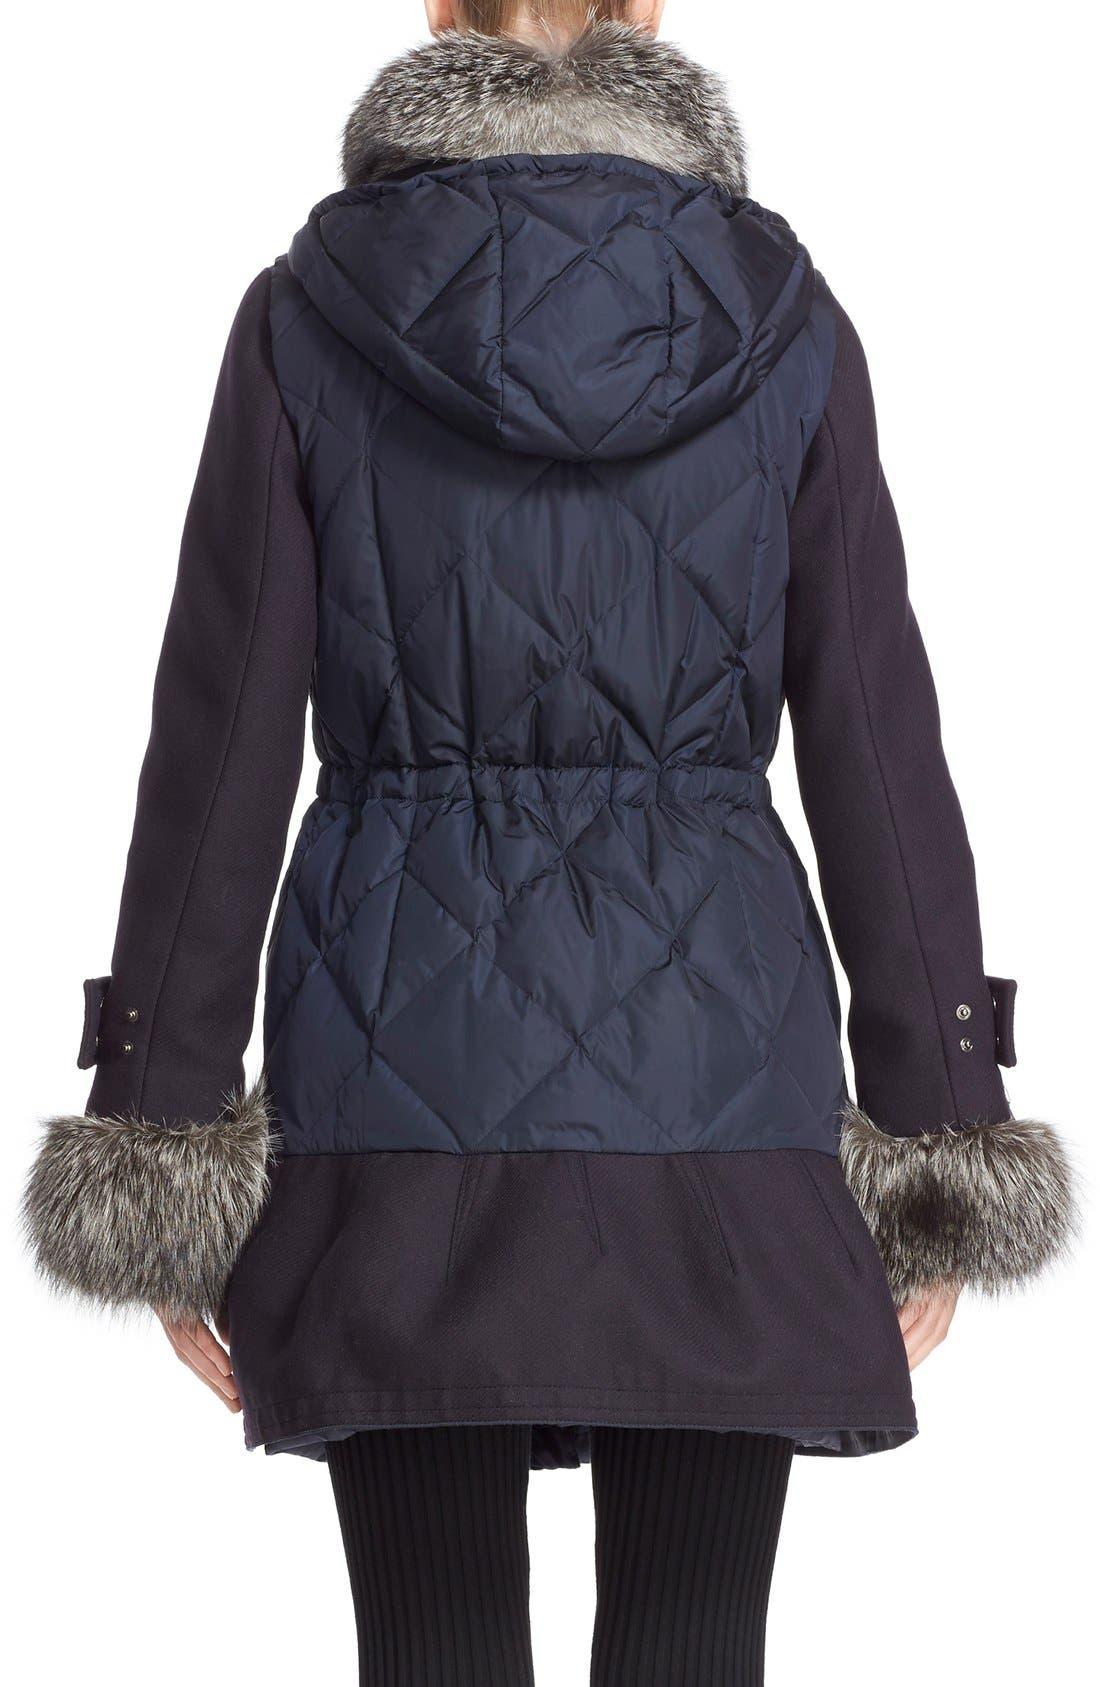 'Elestoria' Two-Piece Down Puffer Coat with Genuine Fox Fur Trim,                             Alternate thumbnail 9, color,                             419